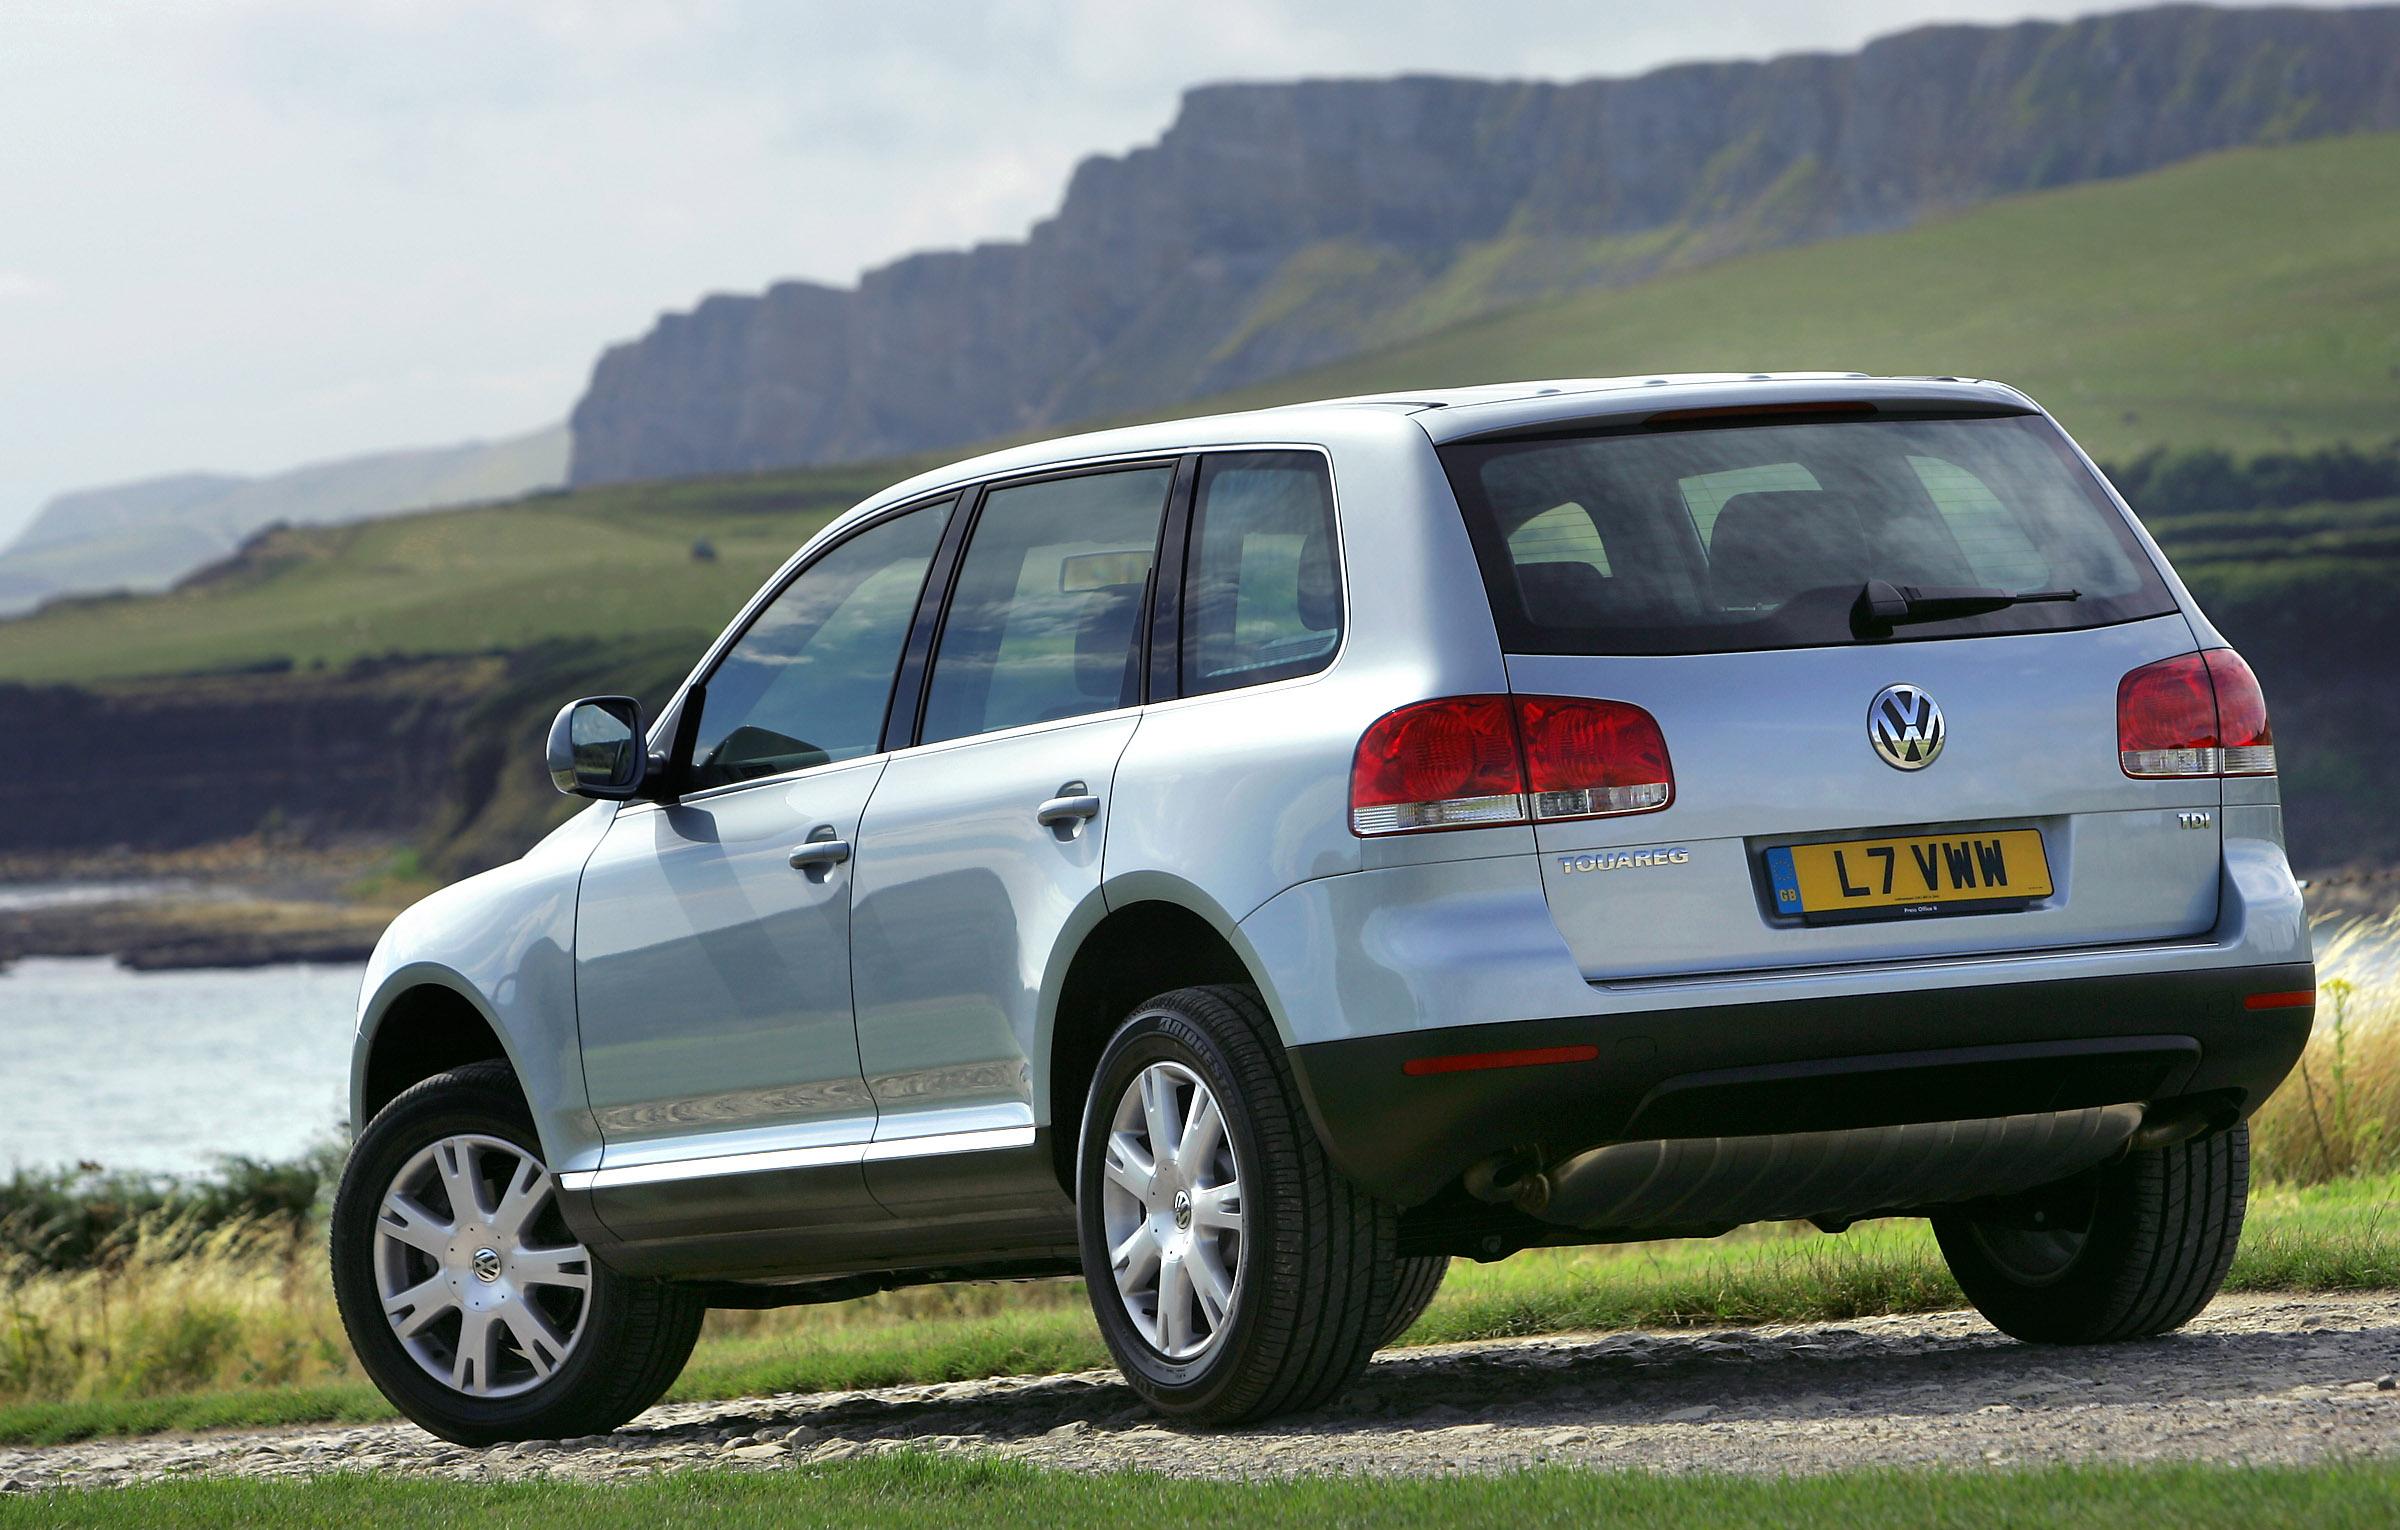 2005 Volkswagen Touareg - Picture 71860